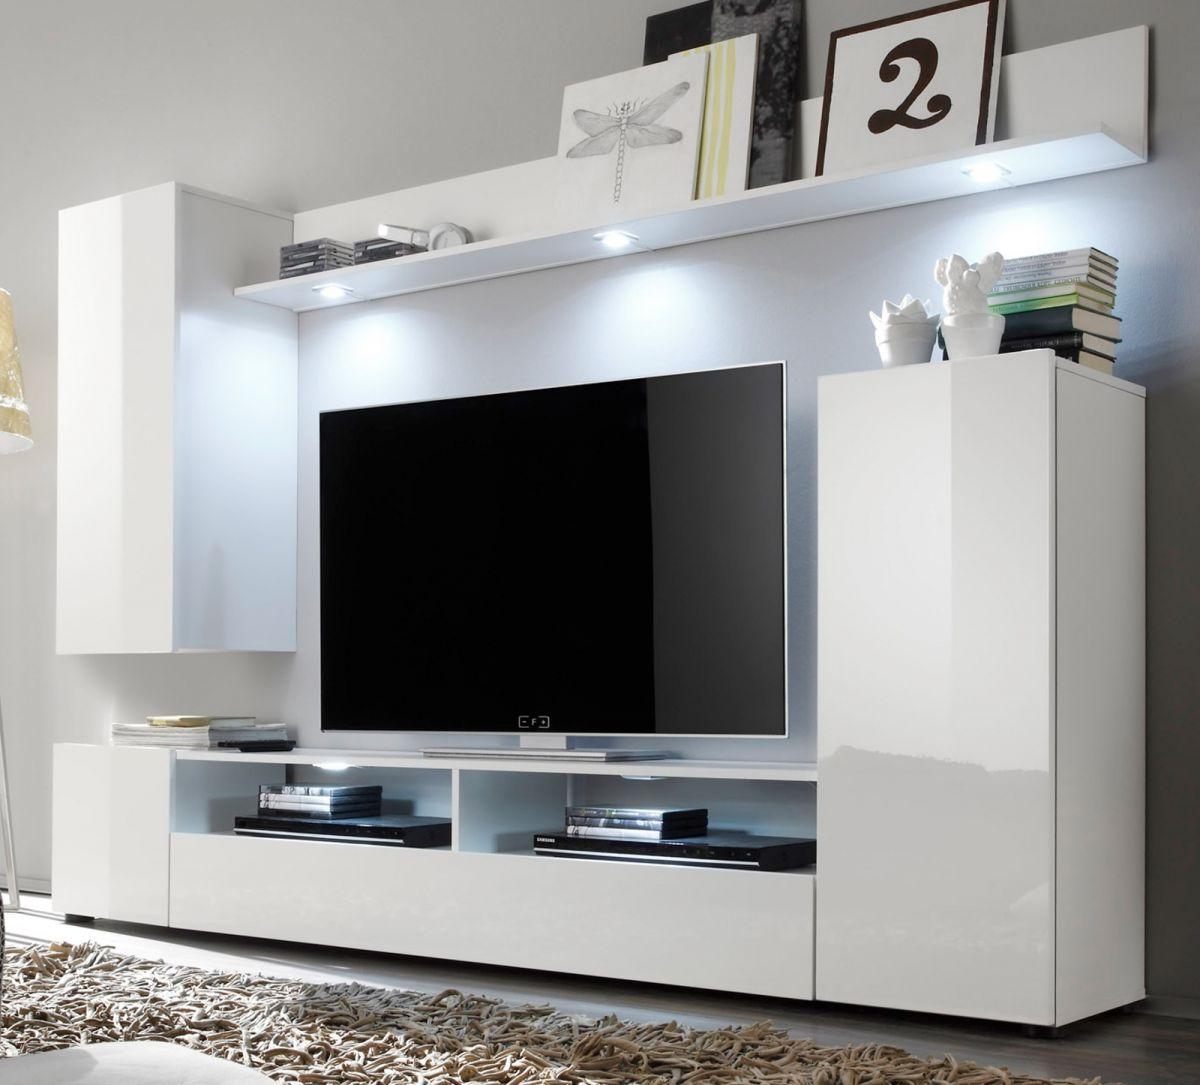 tv medienwand tv medienwand olli von roller ansehen tv medienwand olli wohnwand wei schwarz. Black Bedroom Furniture Sets. Home Design Ideas